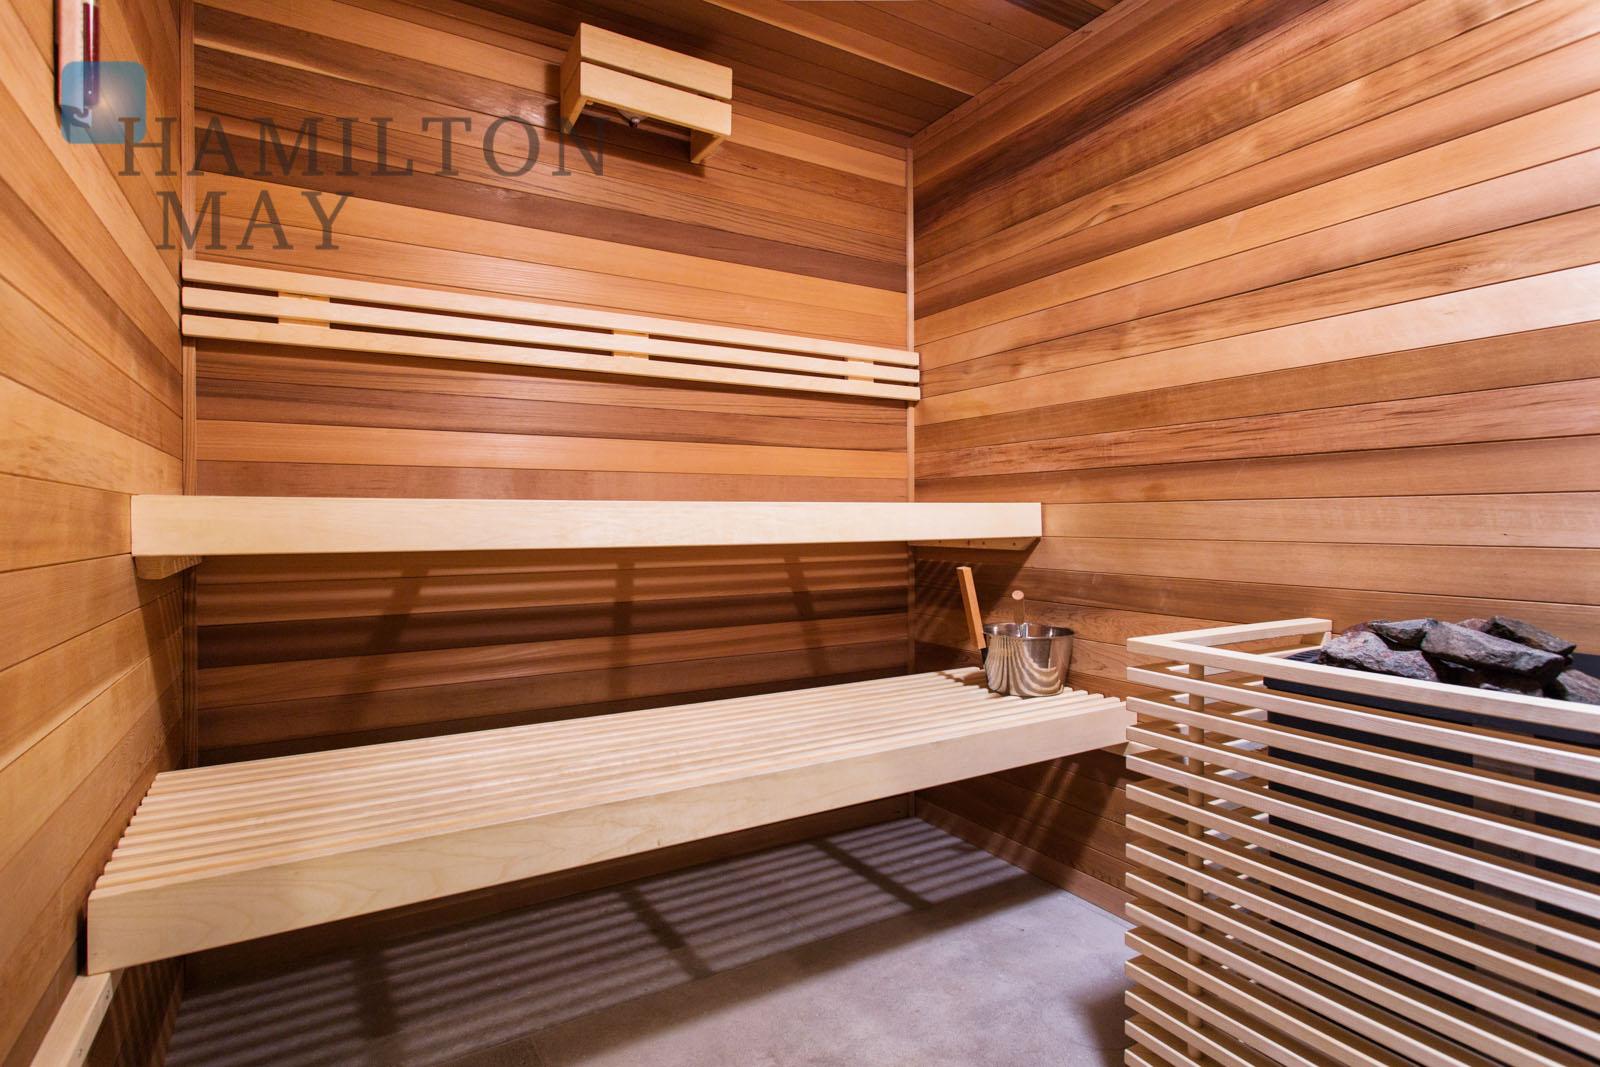 High standard 2-bedroom apartment for rent in the Angel Wawel development Krakow for rent